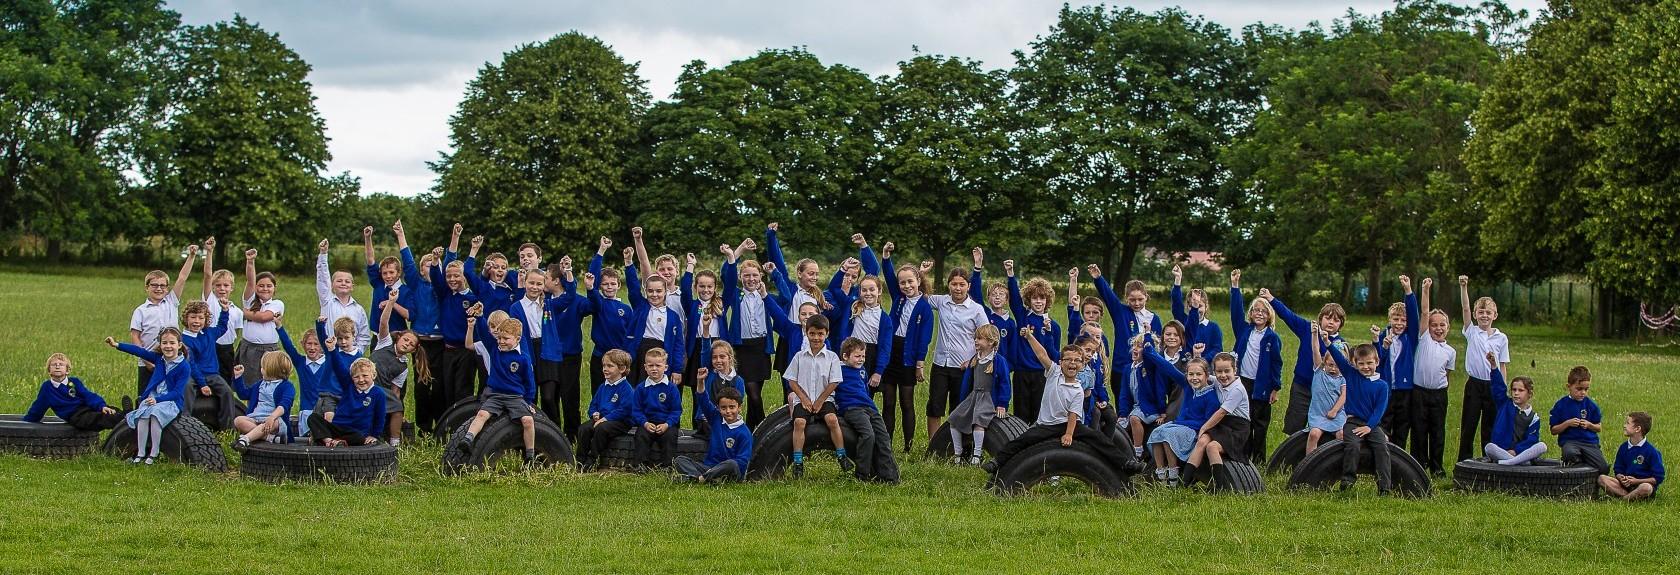 Essex School Class Photography